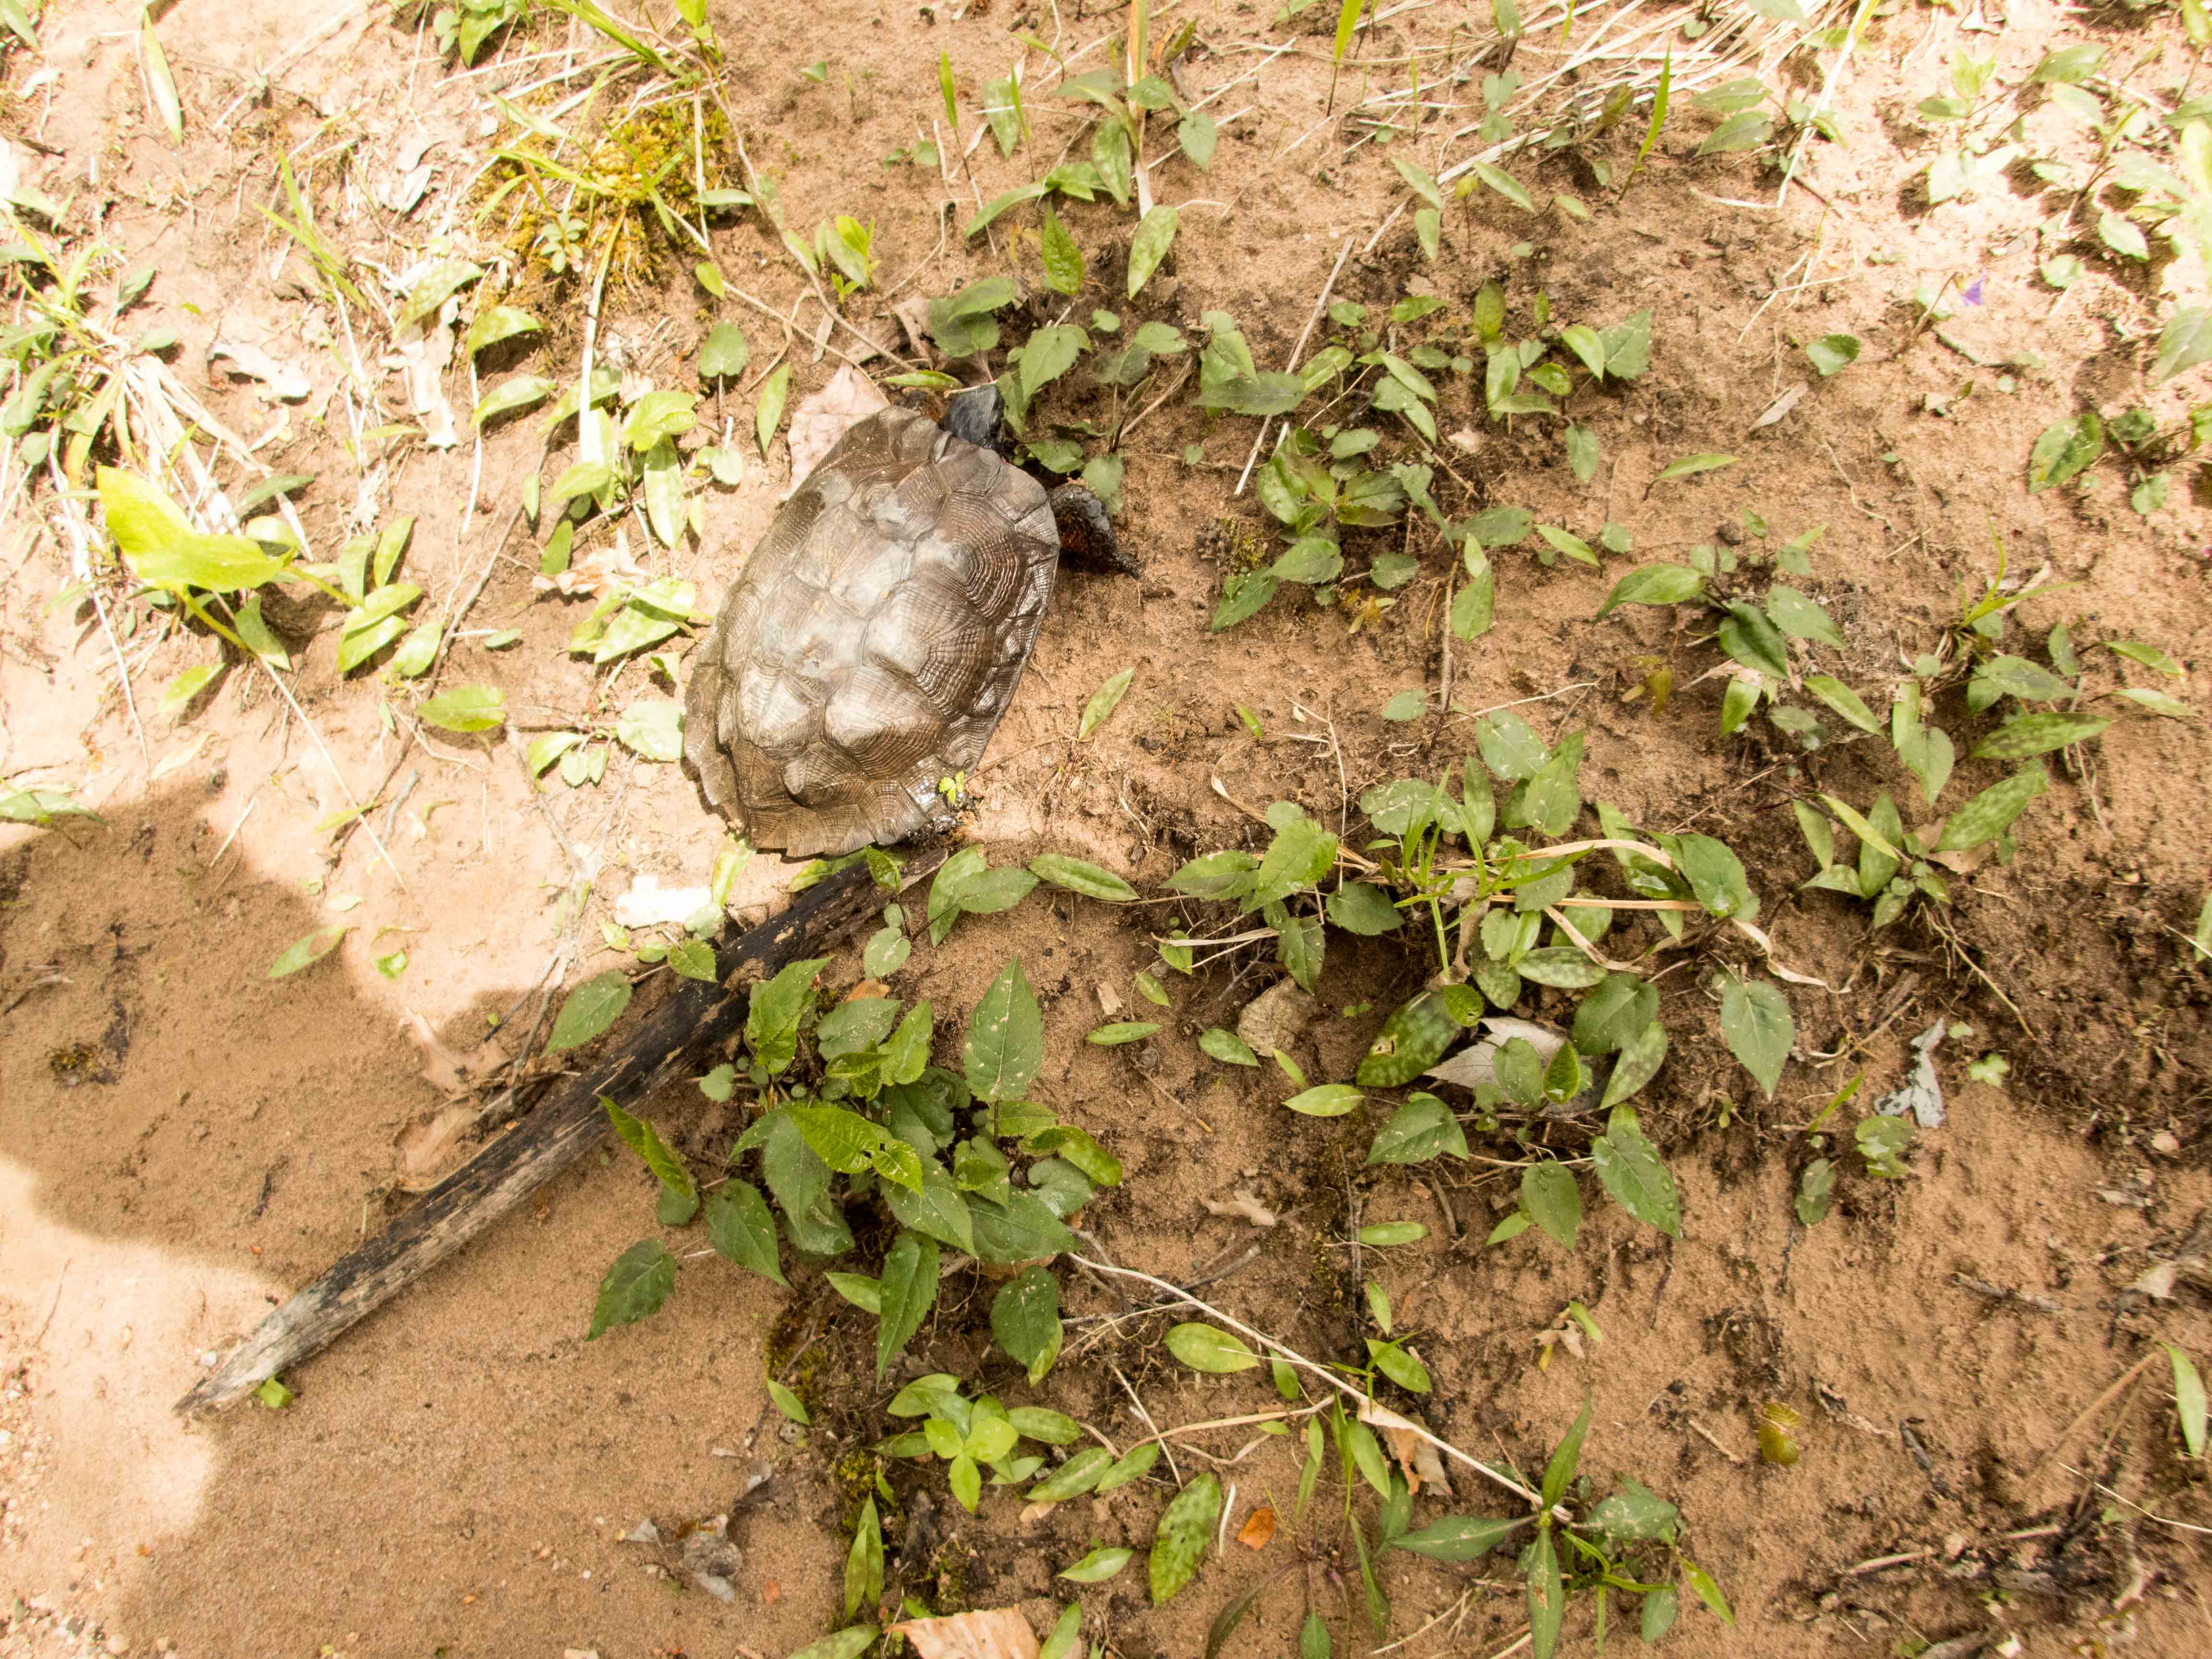 Adult Female Glyptemys insculpta (Wood Turtle), Lancaster County, PA